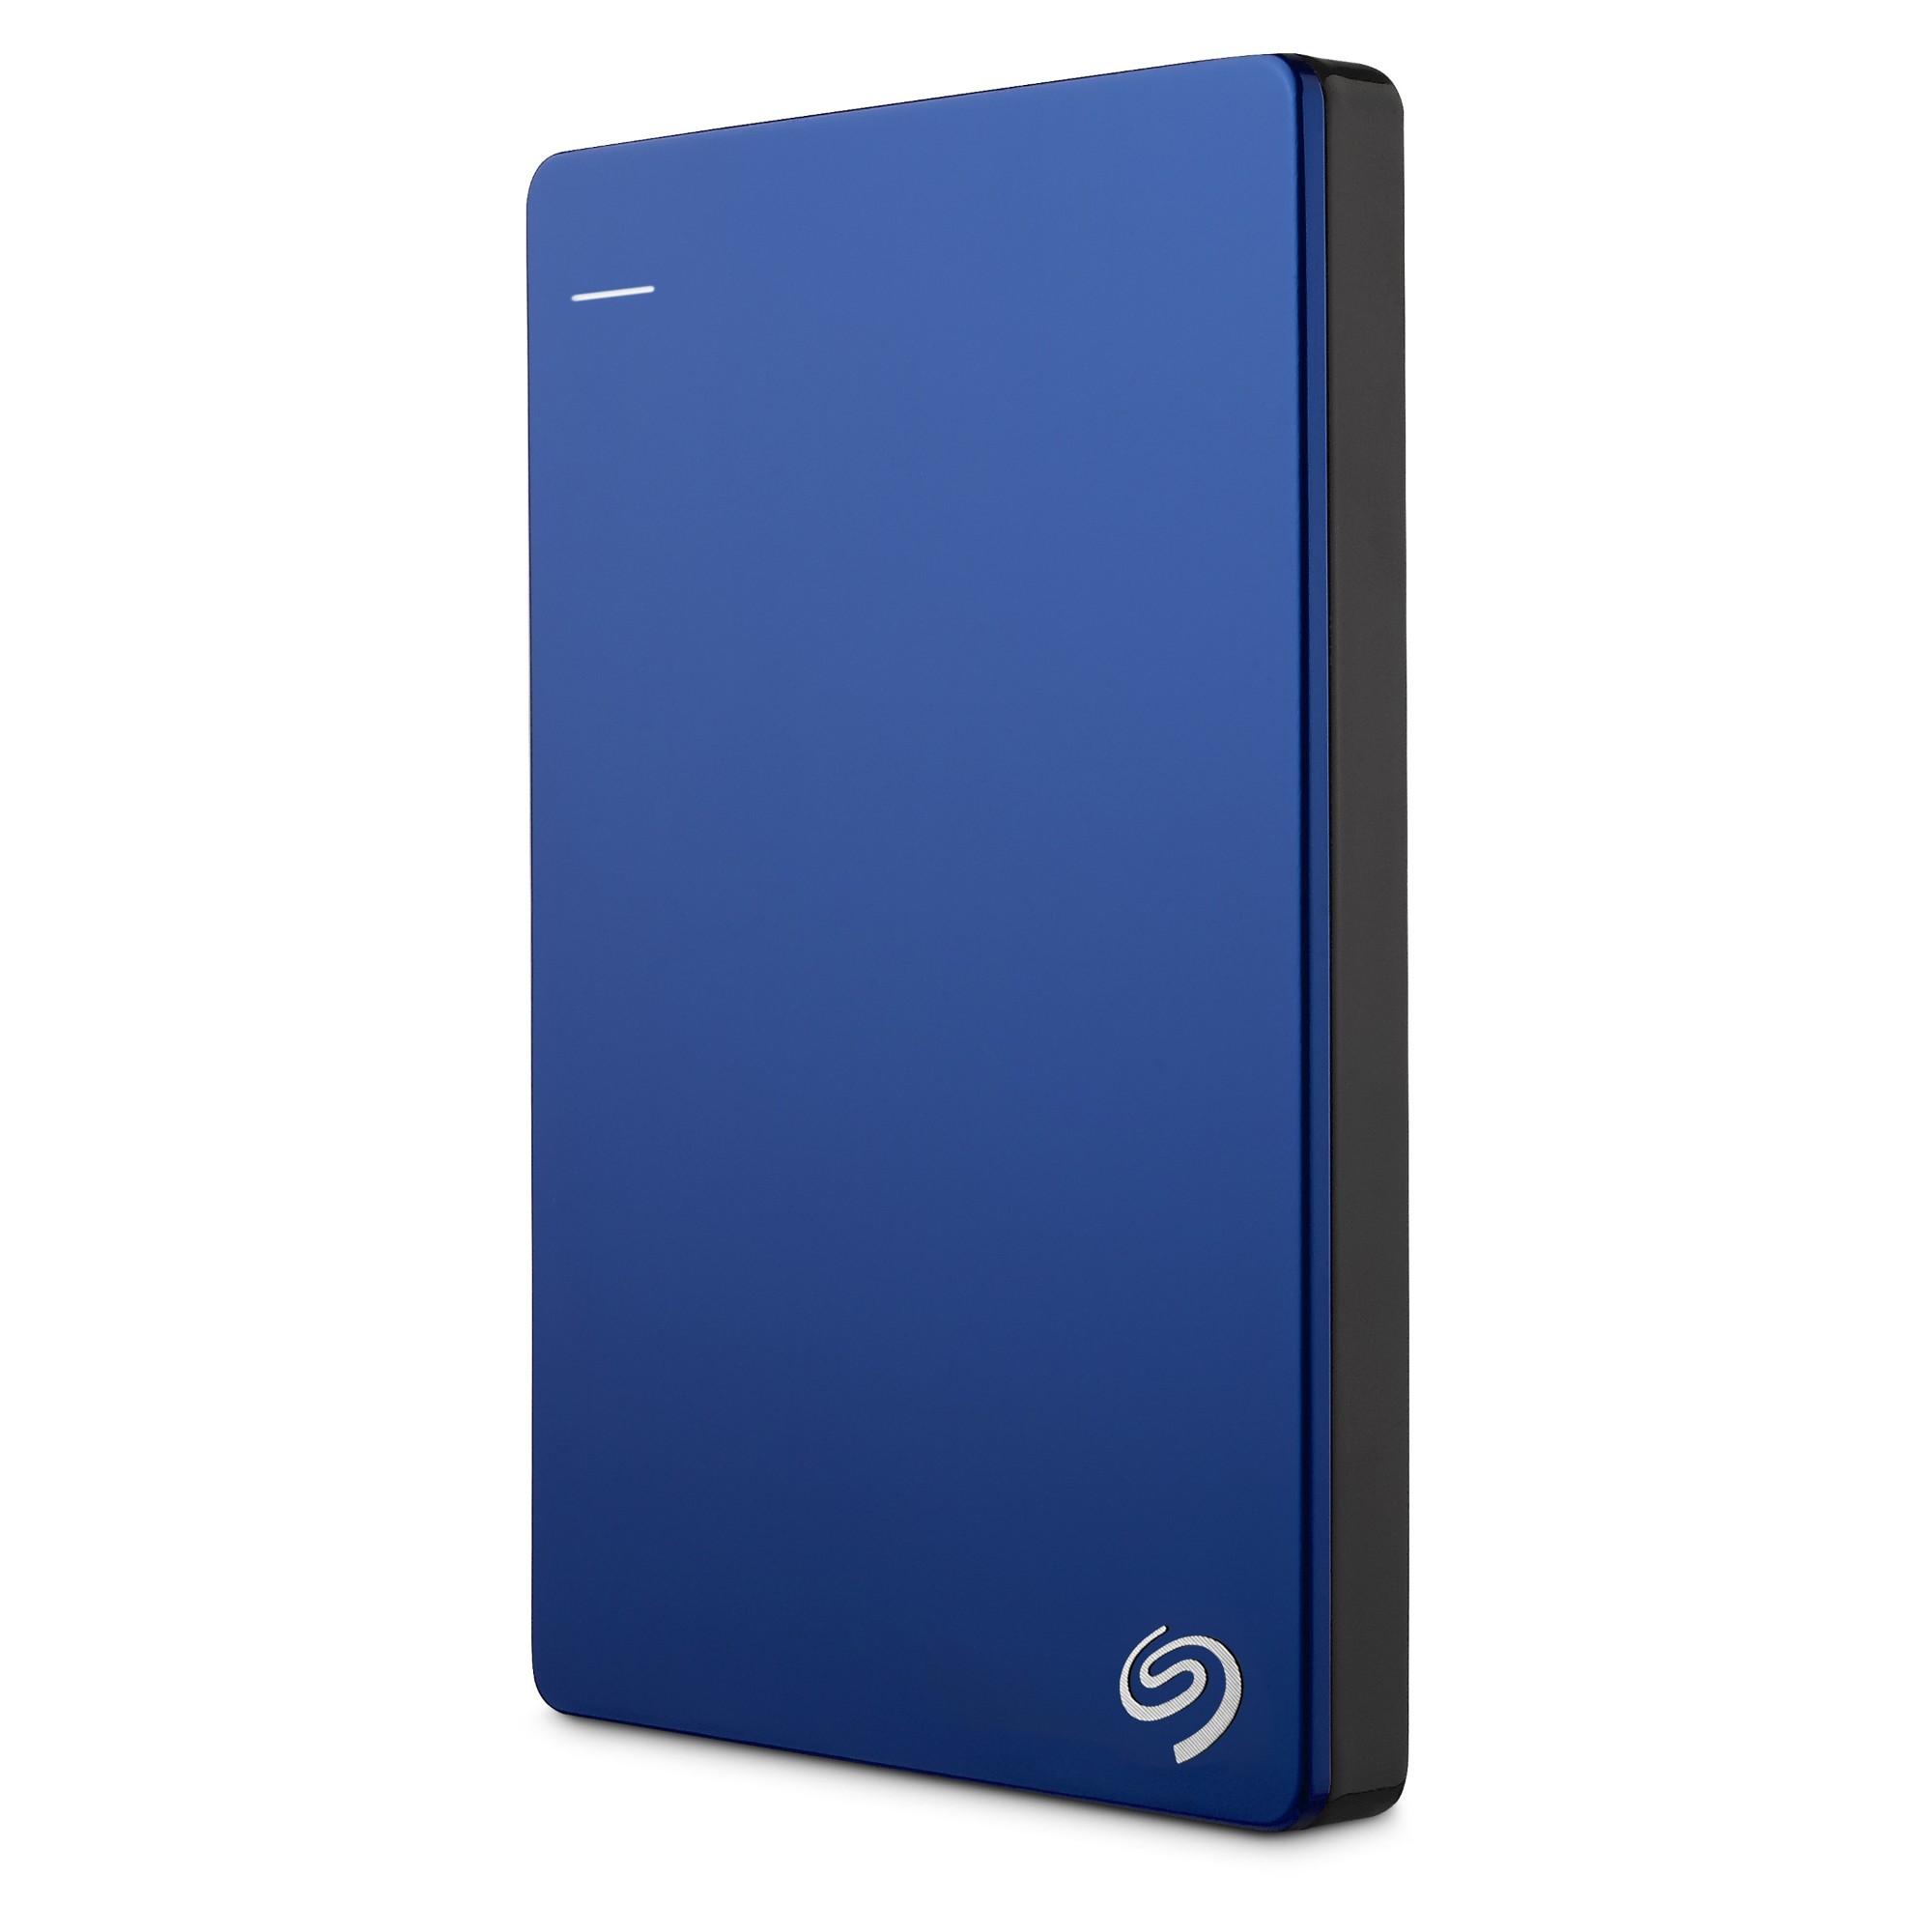 Seagate Backup Plus 2TB Slim Portable Drive, Blue